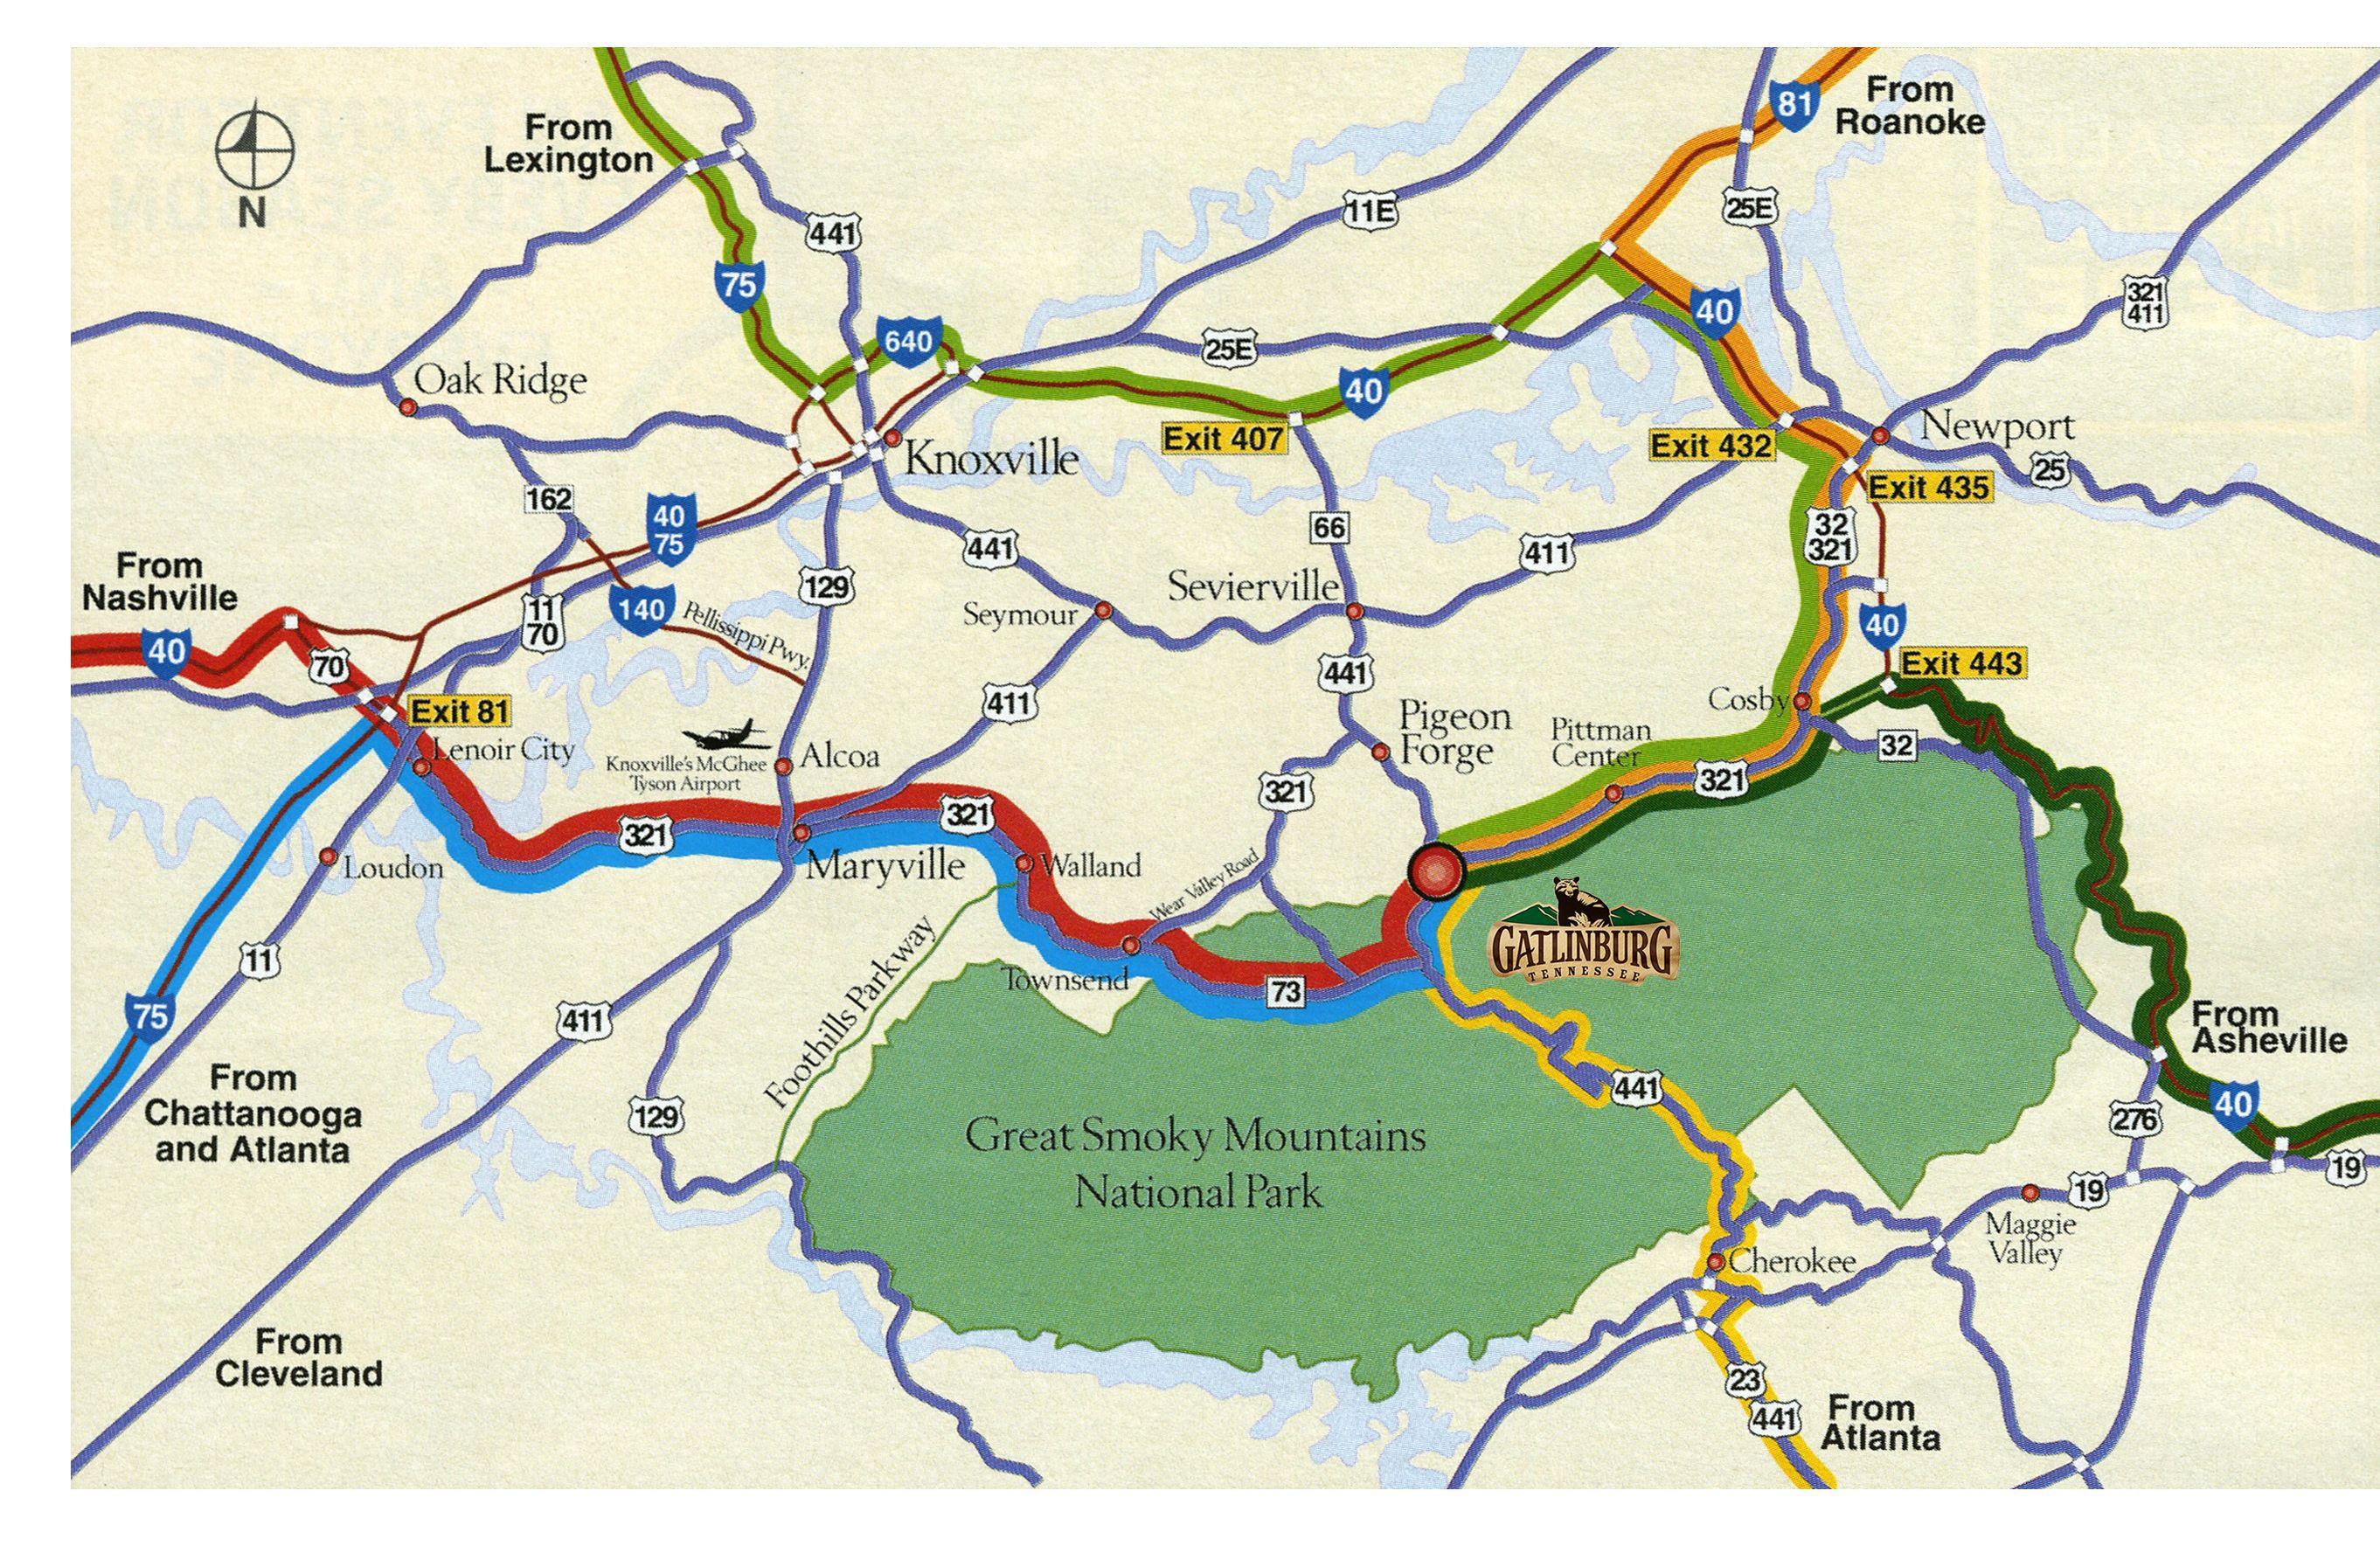 Map of Gatlinburg - Gatlinburg Trolley Map - Gatlinburg TN ... Gatlinburg Tennessee Map on blountville tennessee map, algood tennessee map, titanic museum, united states map, pigeon forge, smoky mountains tennessee map, crossville tennessee map, gallatin tennessee map, ober gatlinburg, great smoky mountains national park, nashville tennessee map, pigeon forge map, watauga lake tennessee map, maggie valley tennessee map, clingmans dome, little pigeon river tennessee map, cades cove, knoxville tn area map, sevier county, dallas tennessee map, great smoky mountains, hardin valley tennessee map, la follette tennessee map, cherokee tennessee map, city tennessee map, johnson city, sneedville tennessee map, gruetli laager tennessee map, mosheim tennessee map,